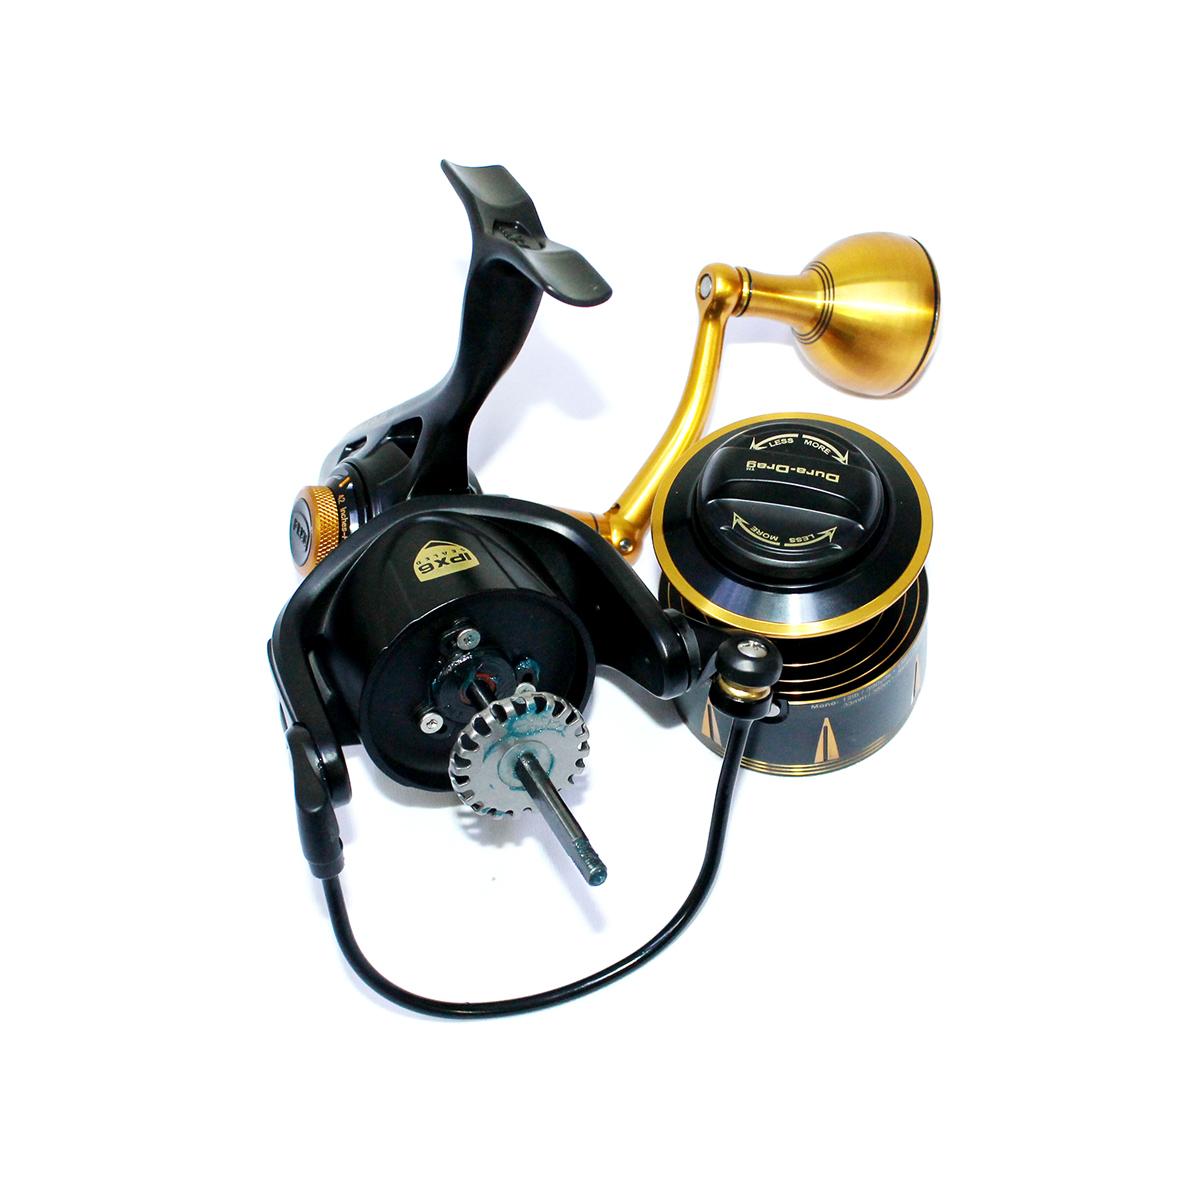 Máy Câu Cá Penn Slammer III 6500 SLA6500 - Máy Câu Chính Hãng BH 12 Tháng